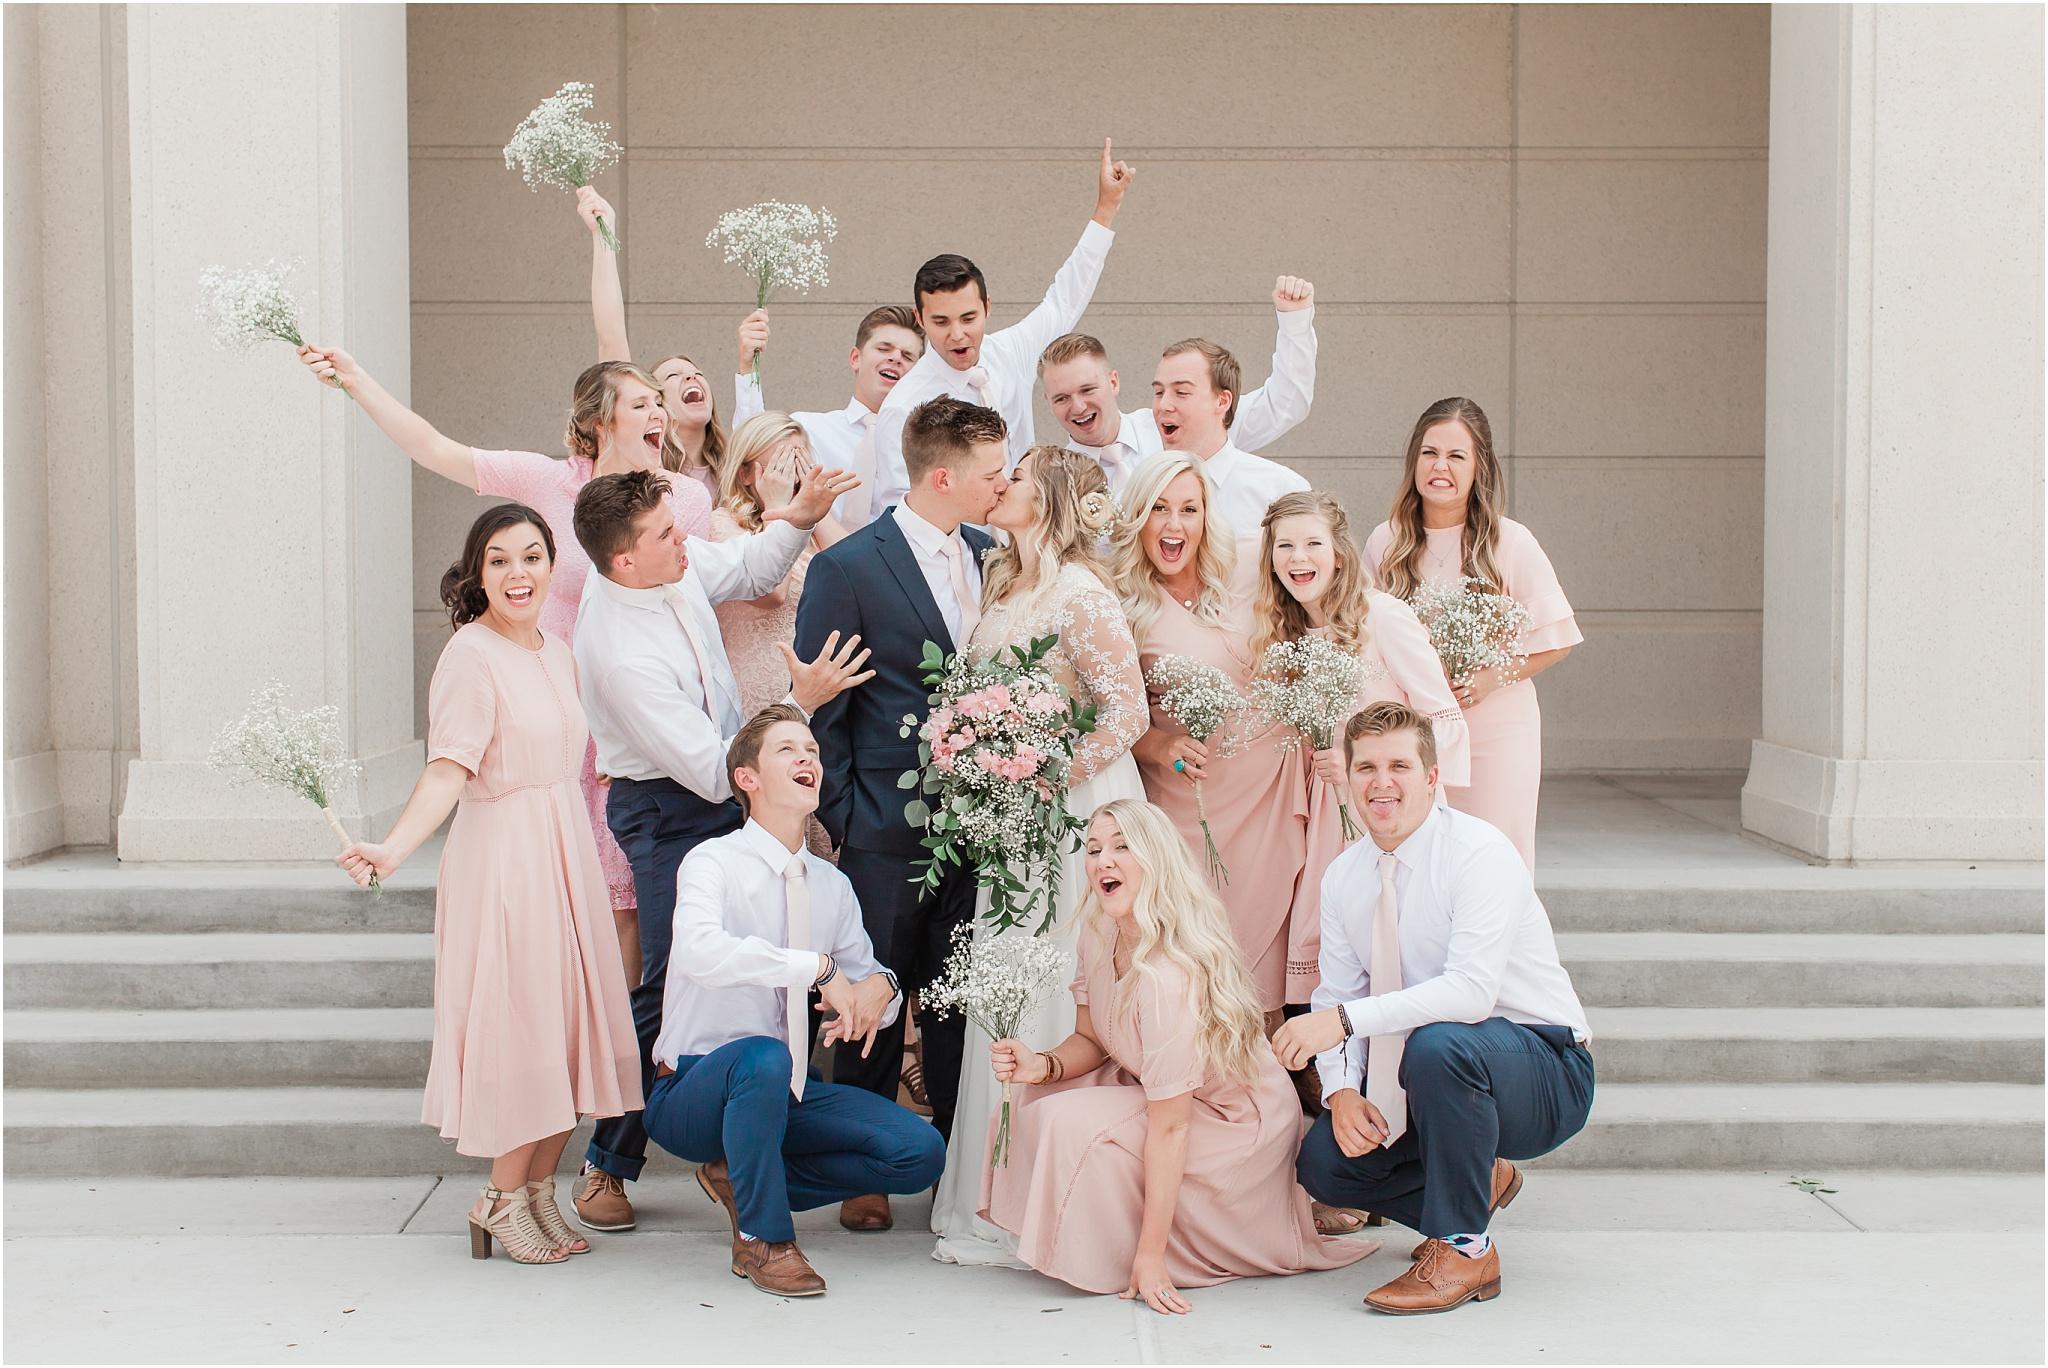 Wedding Photography_Meridian Idaho Temple_Boise Idaho_Nampa Idaho_Leah Southwick Photography_0038.jpg